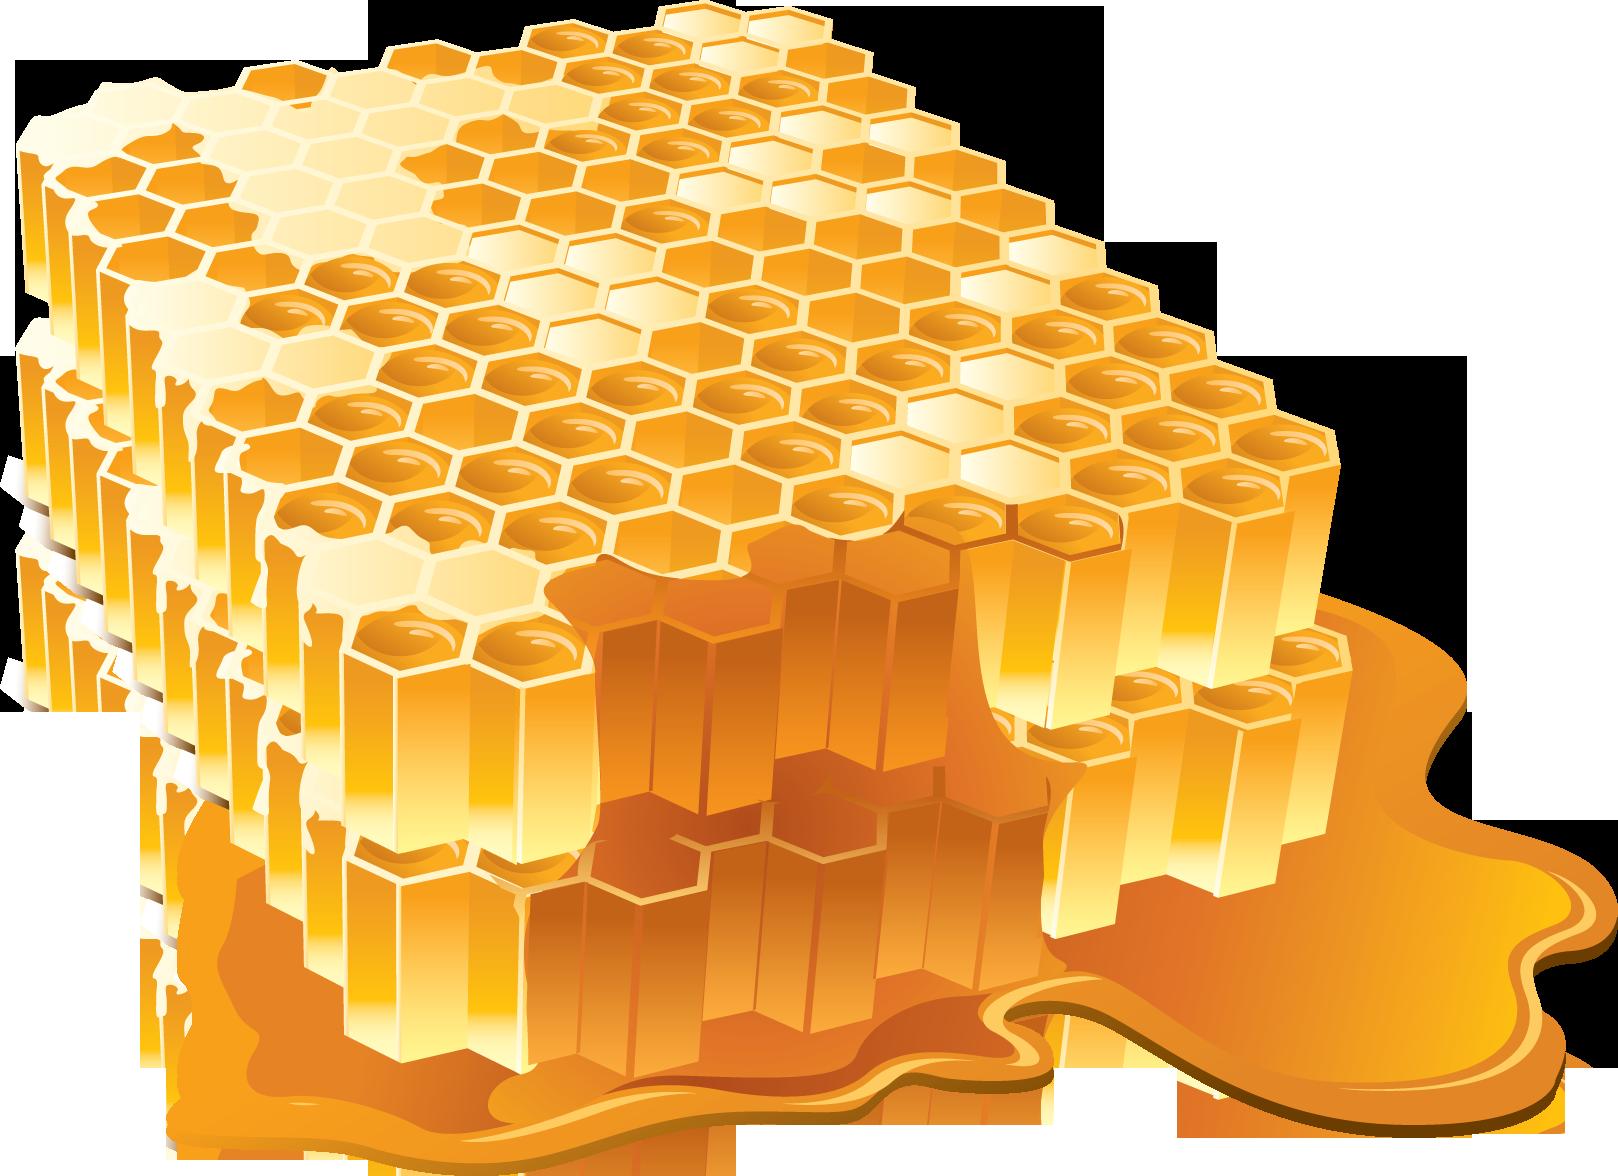 Honeycomb clipart single. Honey png image purepng